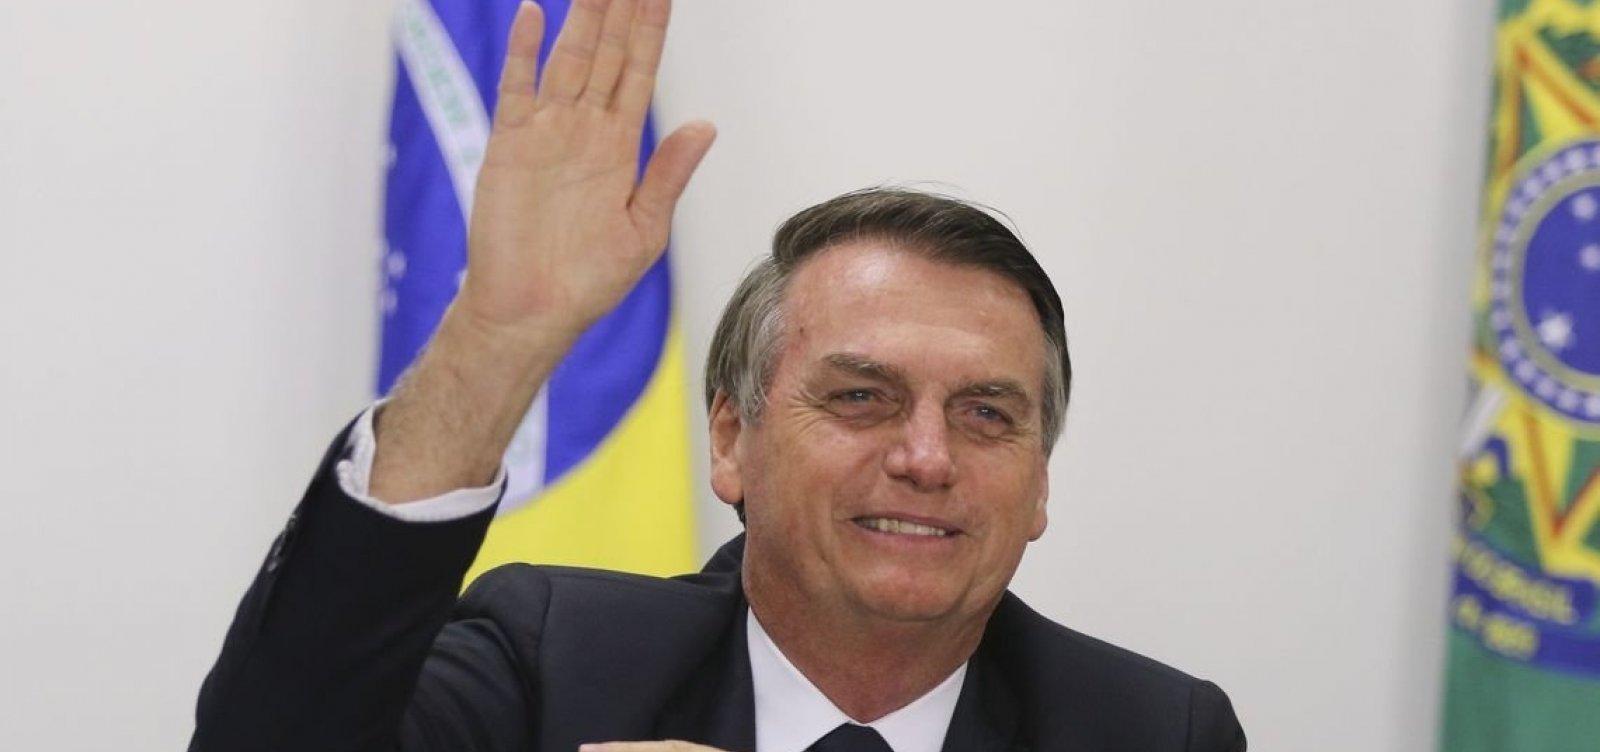 [Decreto de Bolsonaro permite compra de armas antes restritas a polícia e Exército]